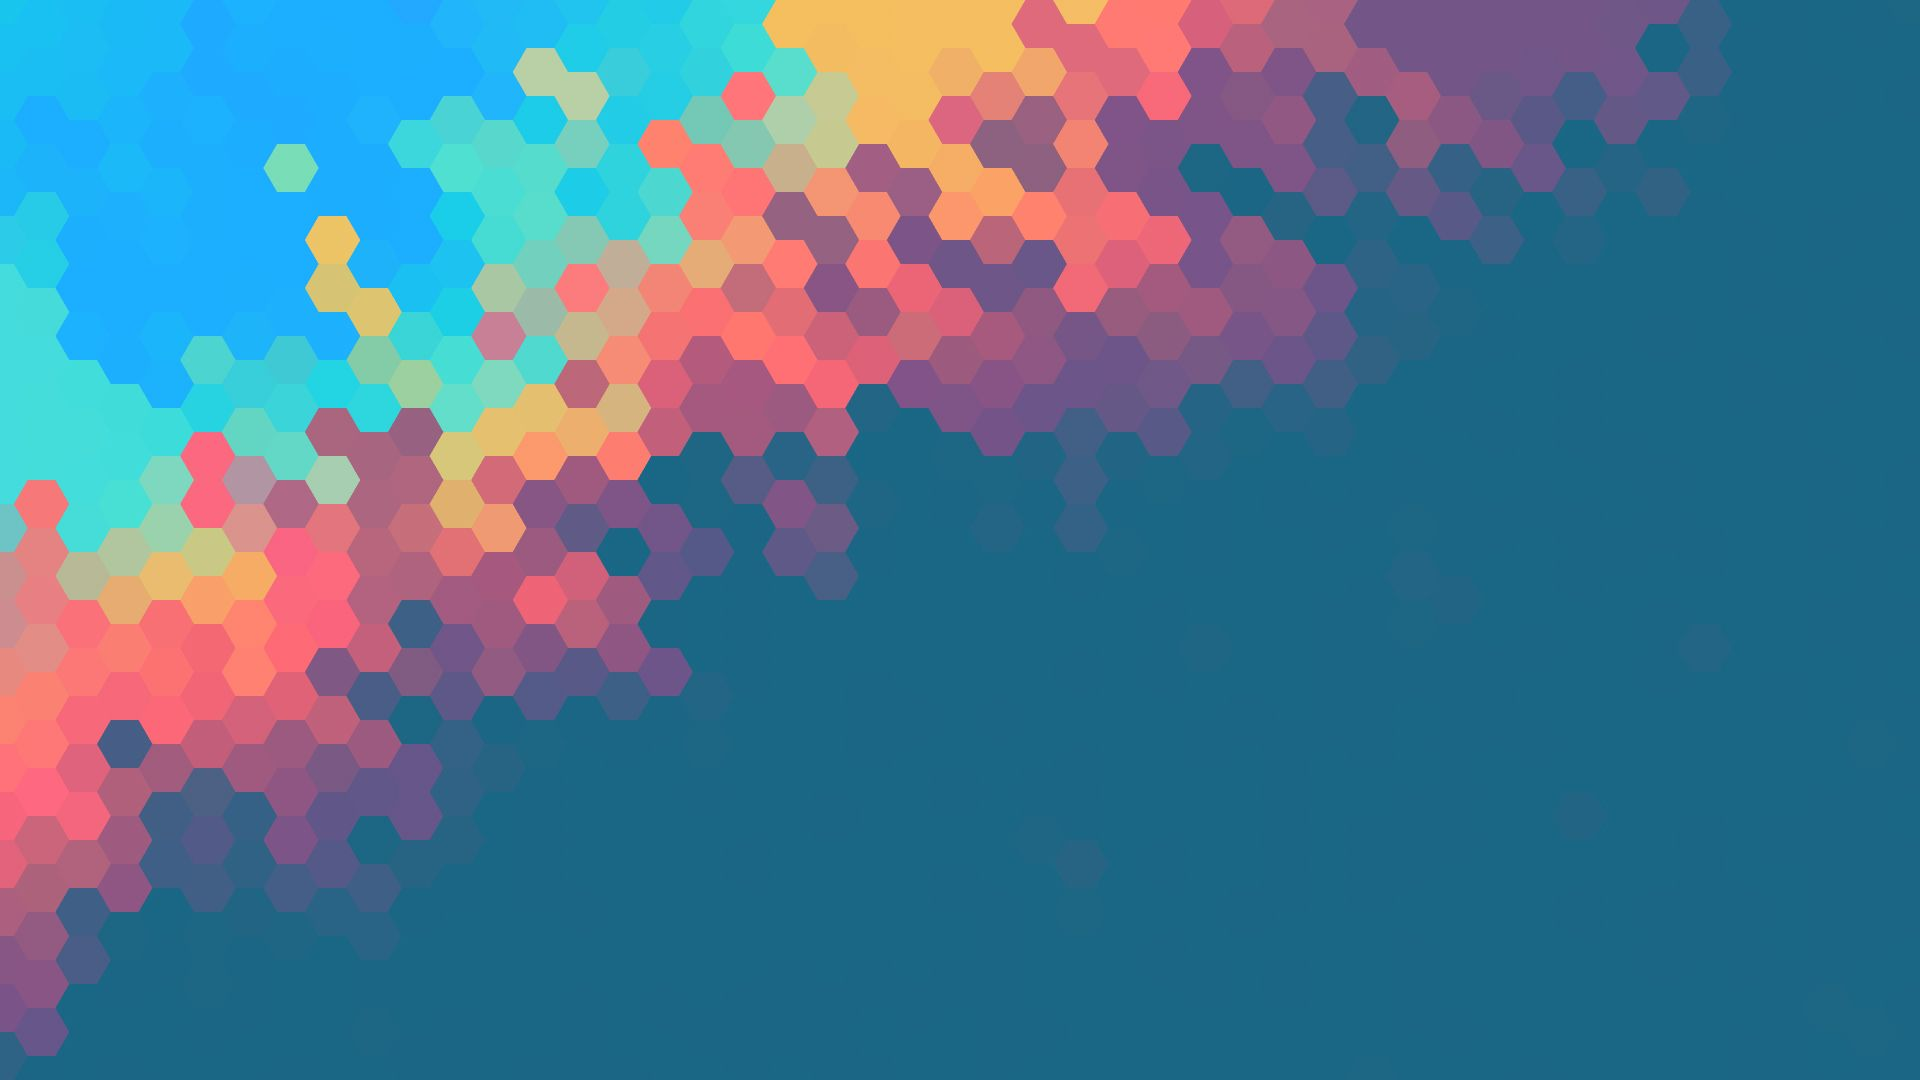 Image Result For Flat Minimal Backgrounds Uhd Wallpaper Minimalist Wallpaper Android Wallpaper